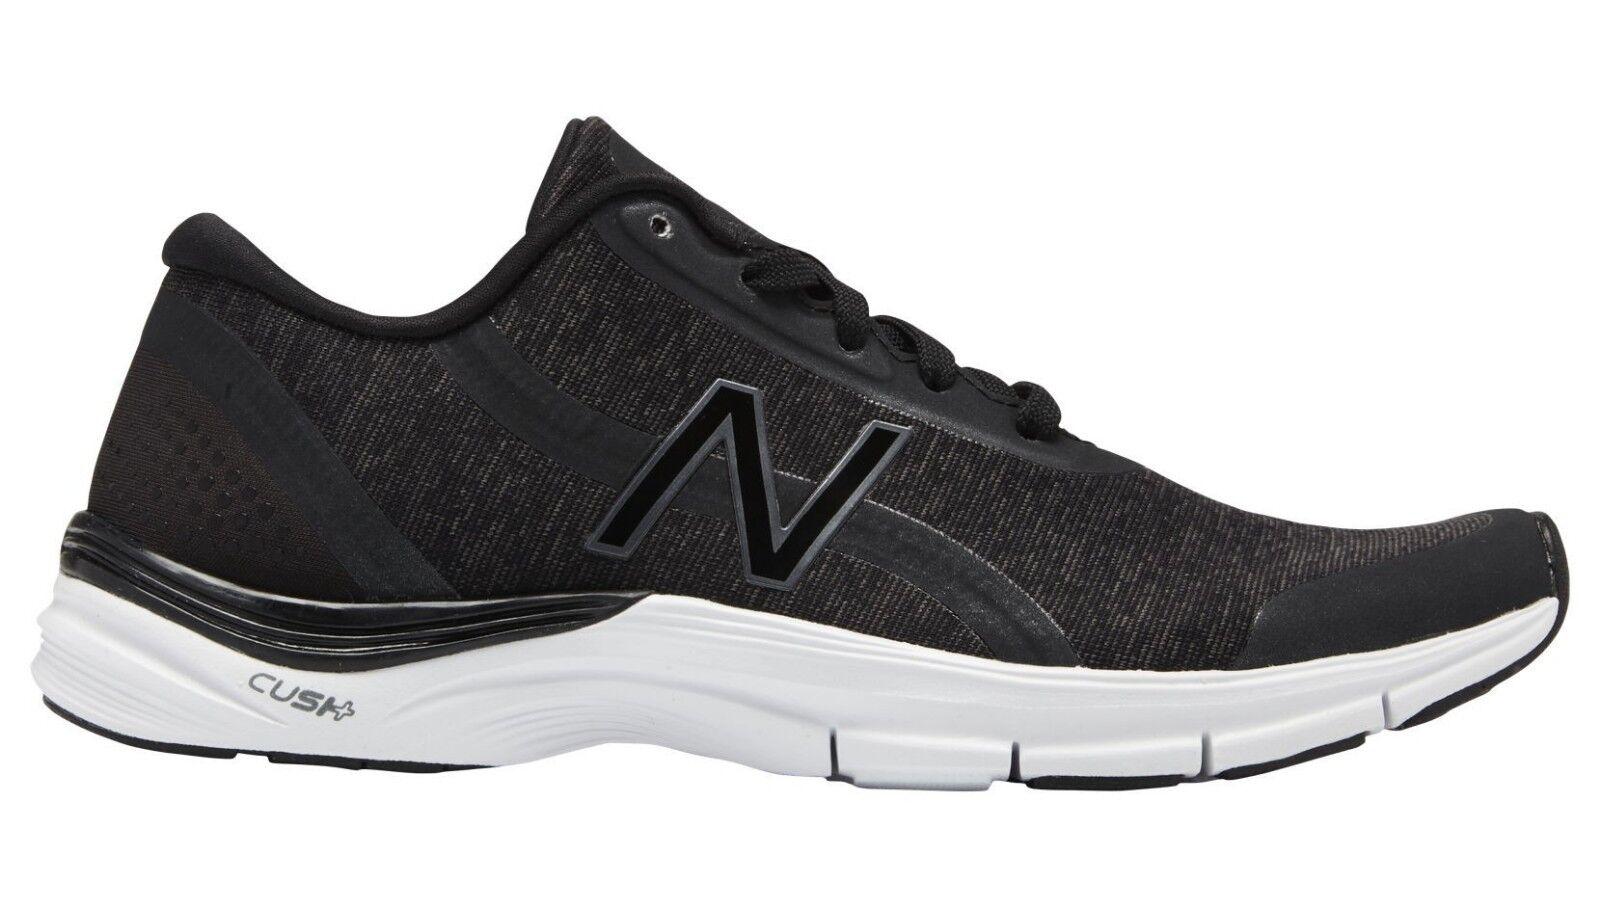 Women's NEW BALANCE Training Grey Black   White Sole shoes Nylon wx711jb3